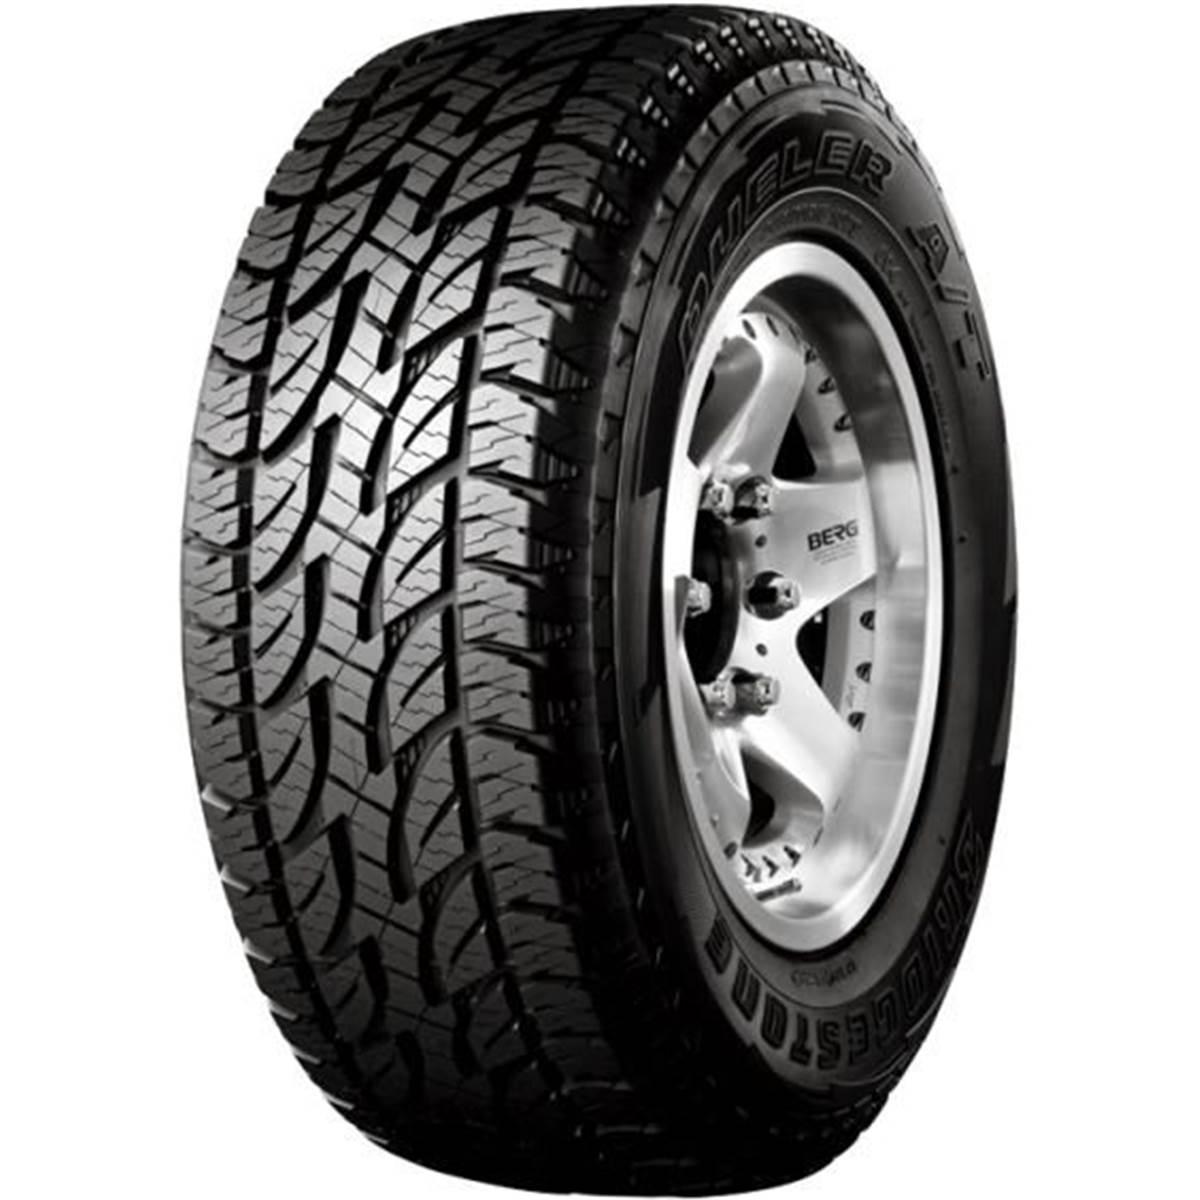 Pneu 4X4 Bridgestone 225/75R16 103S Dueler A/T 694